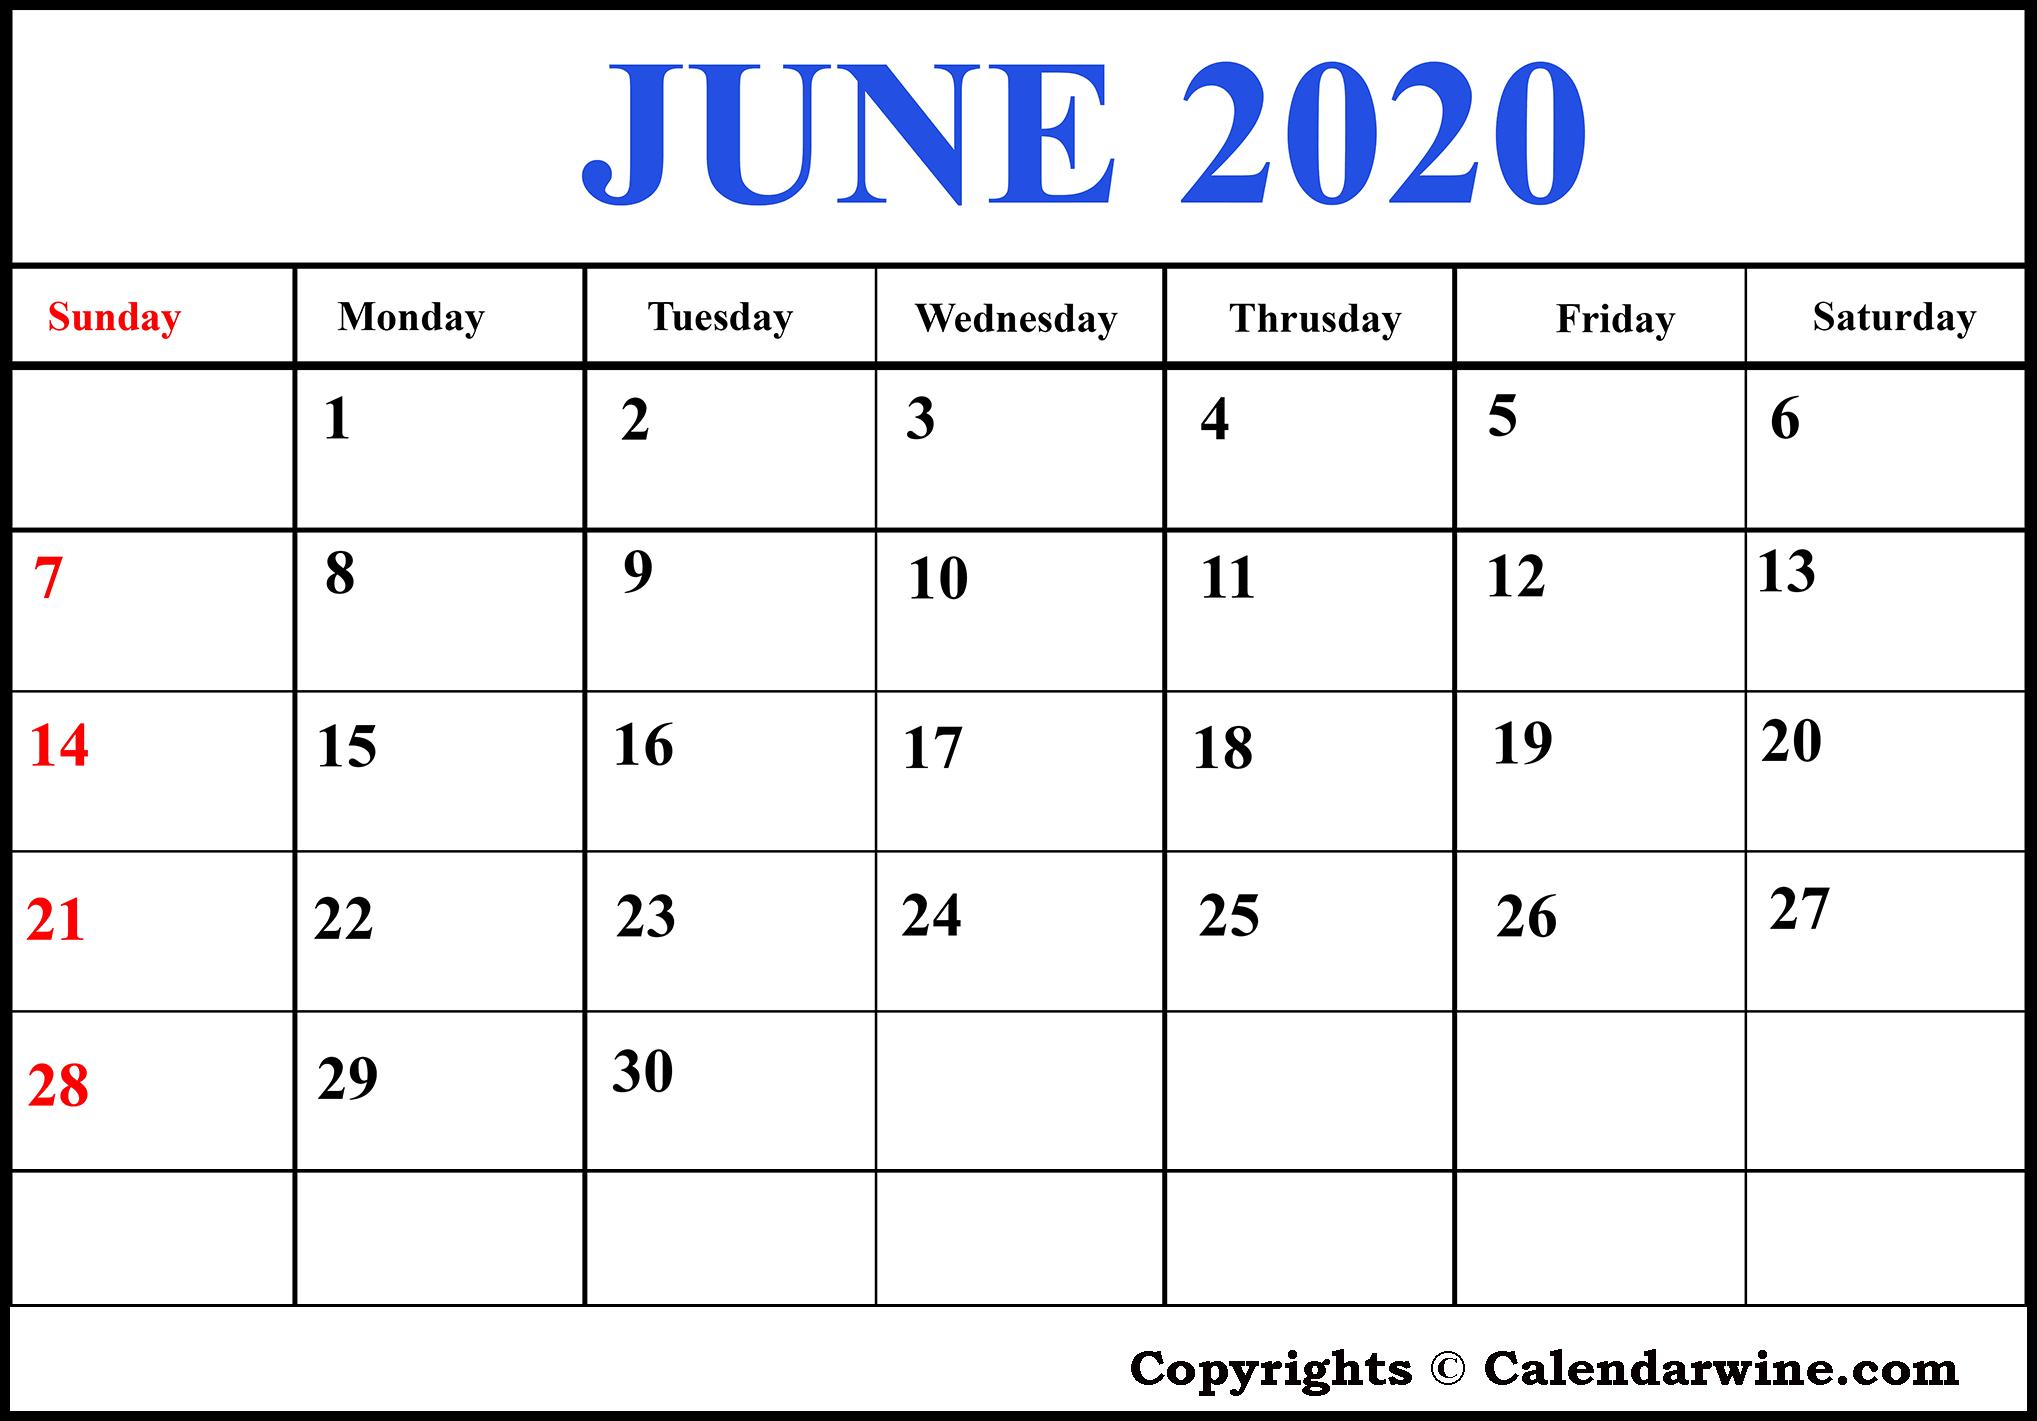 Julian Calendar 2020 Excel   Free Printable Calendar